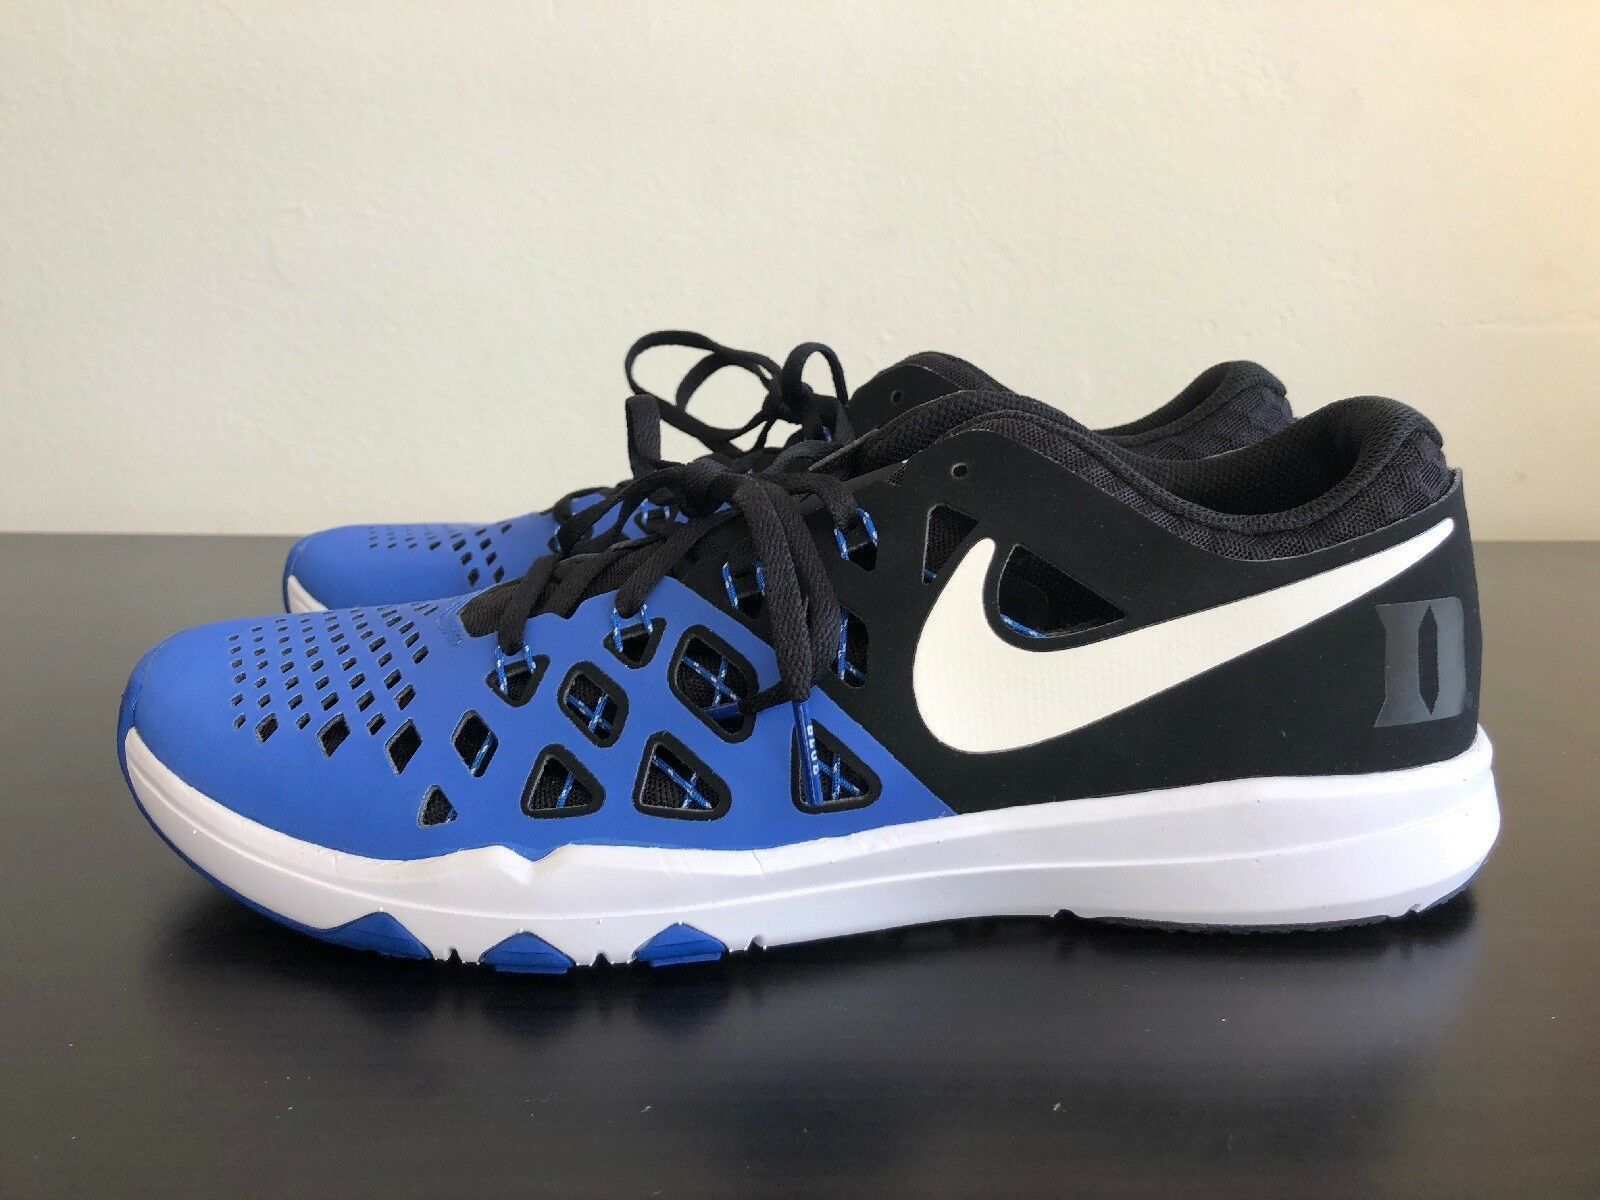 f537149a32280 Nike Train Speed 4 AMP 844102 410 Duke Blue Devils 3M Reflect size 11.5  Running